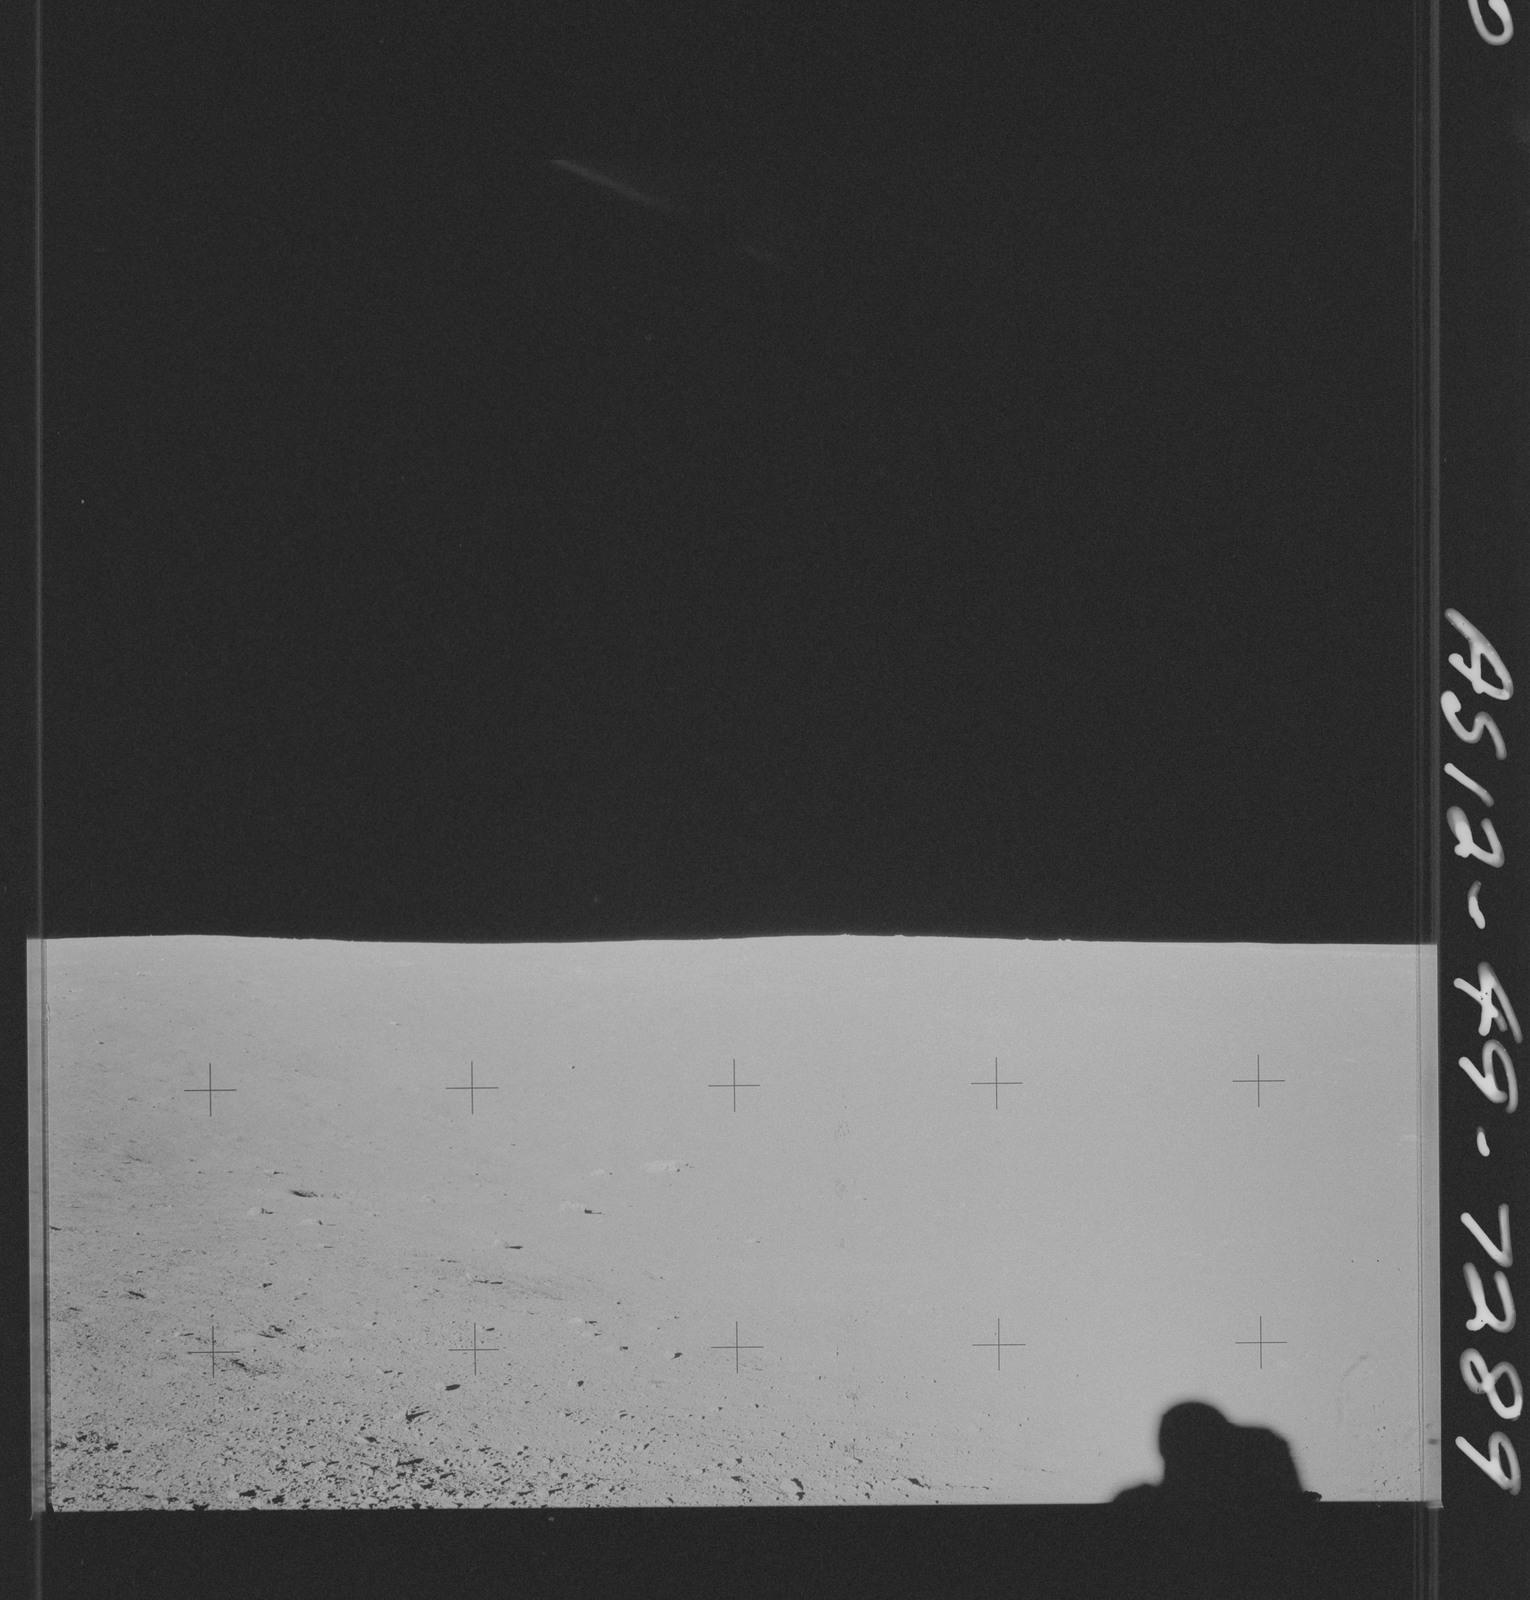 AS12-49-7289 - Apollo 12 - Apollo 12 Mission image  - View of the Lunar terrain